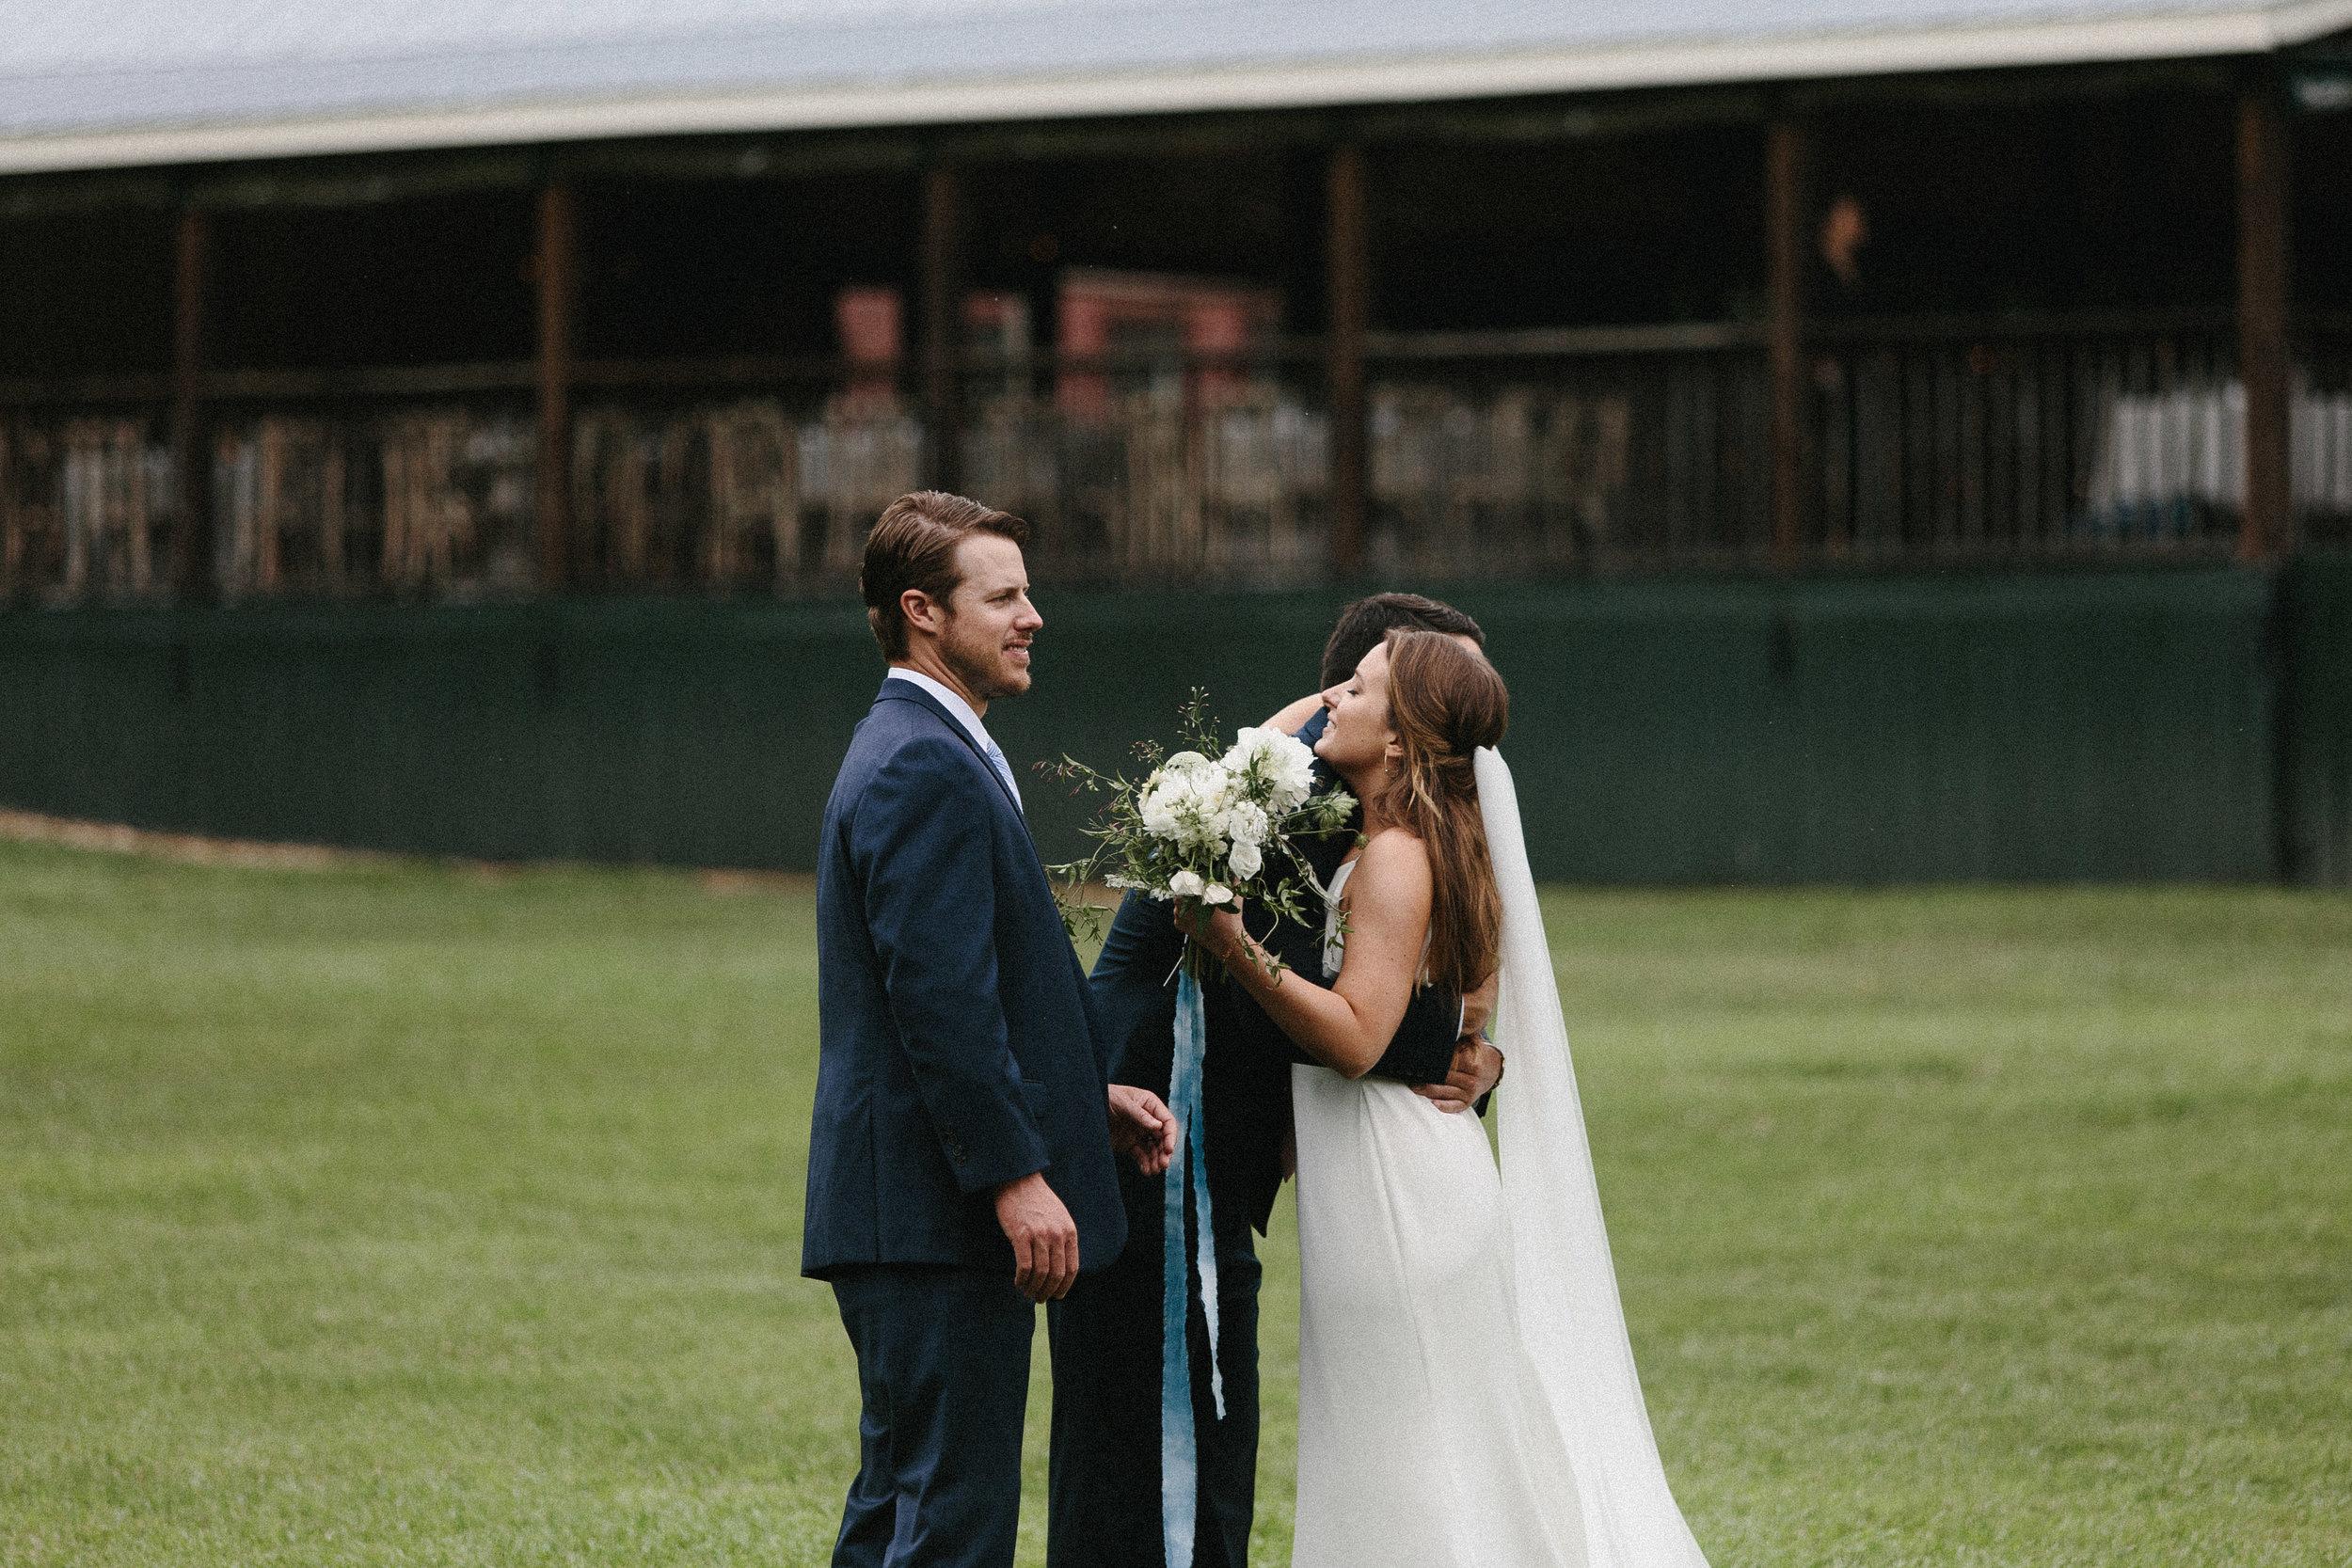 glen_ella_meadow_creekside_atlanta_wedding_photographers_1667.jpg